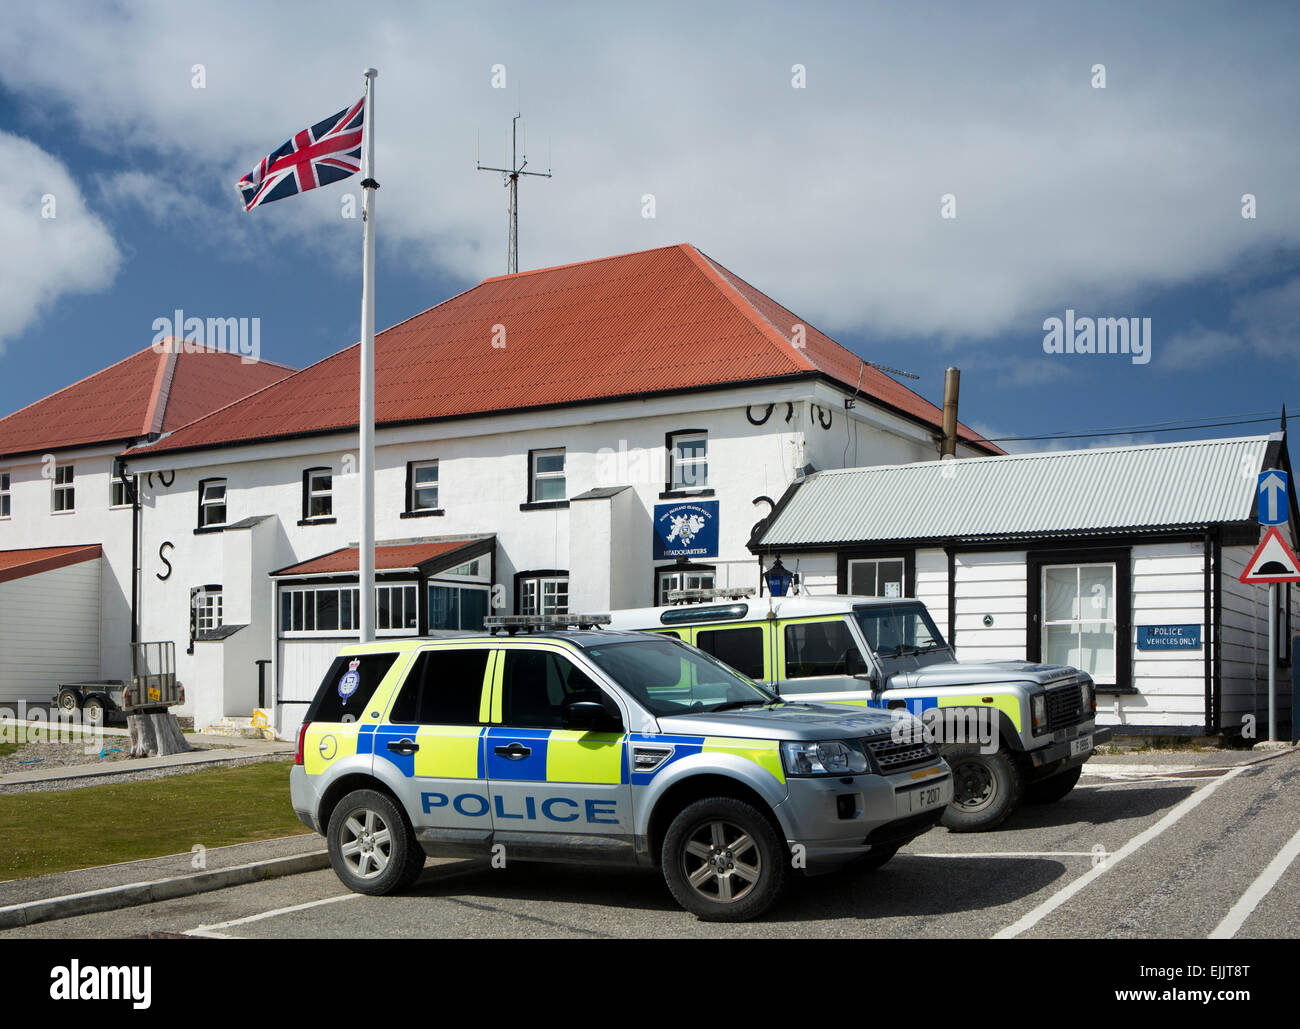 Falklands, Port Stanley, police cars outside Royal Falkland Islands Police Force Headquarters - Stock Image